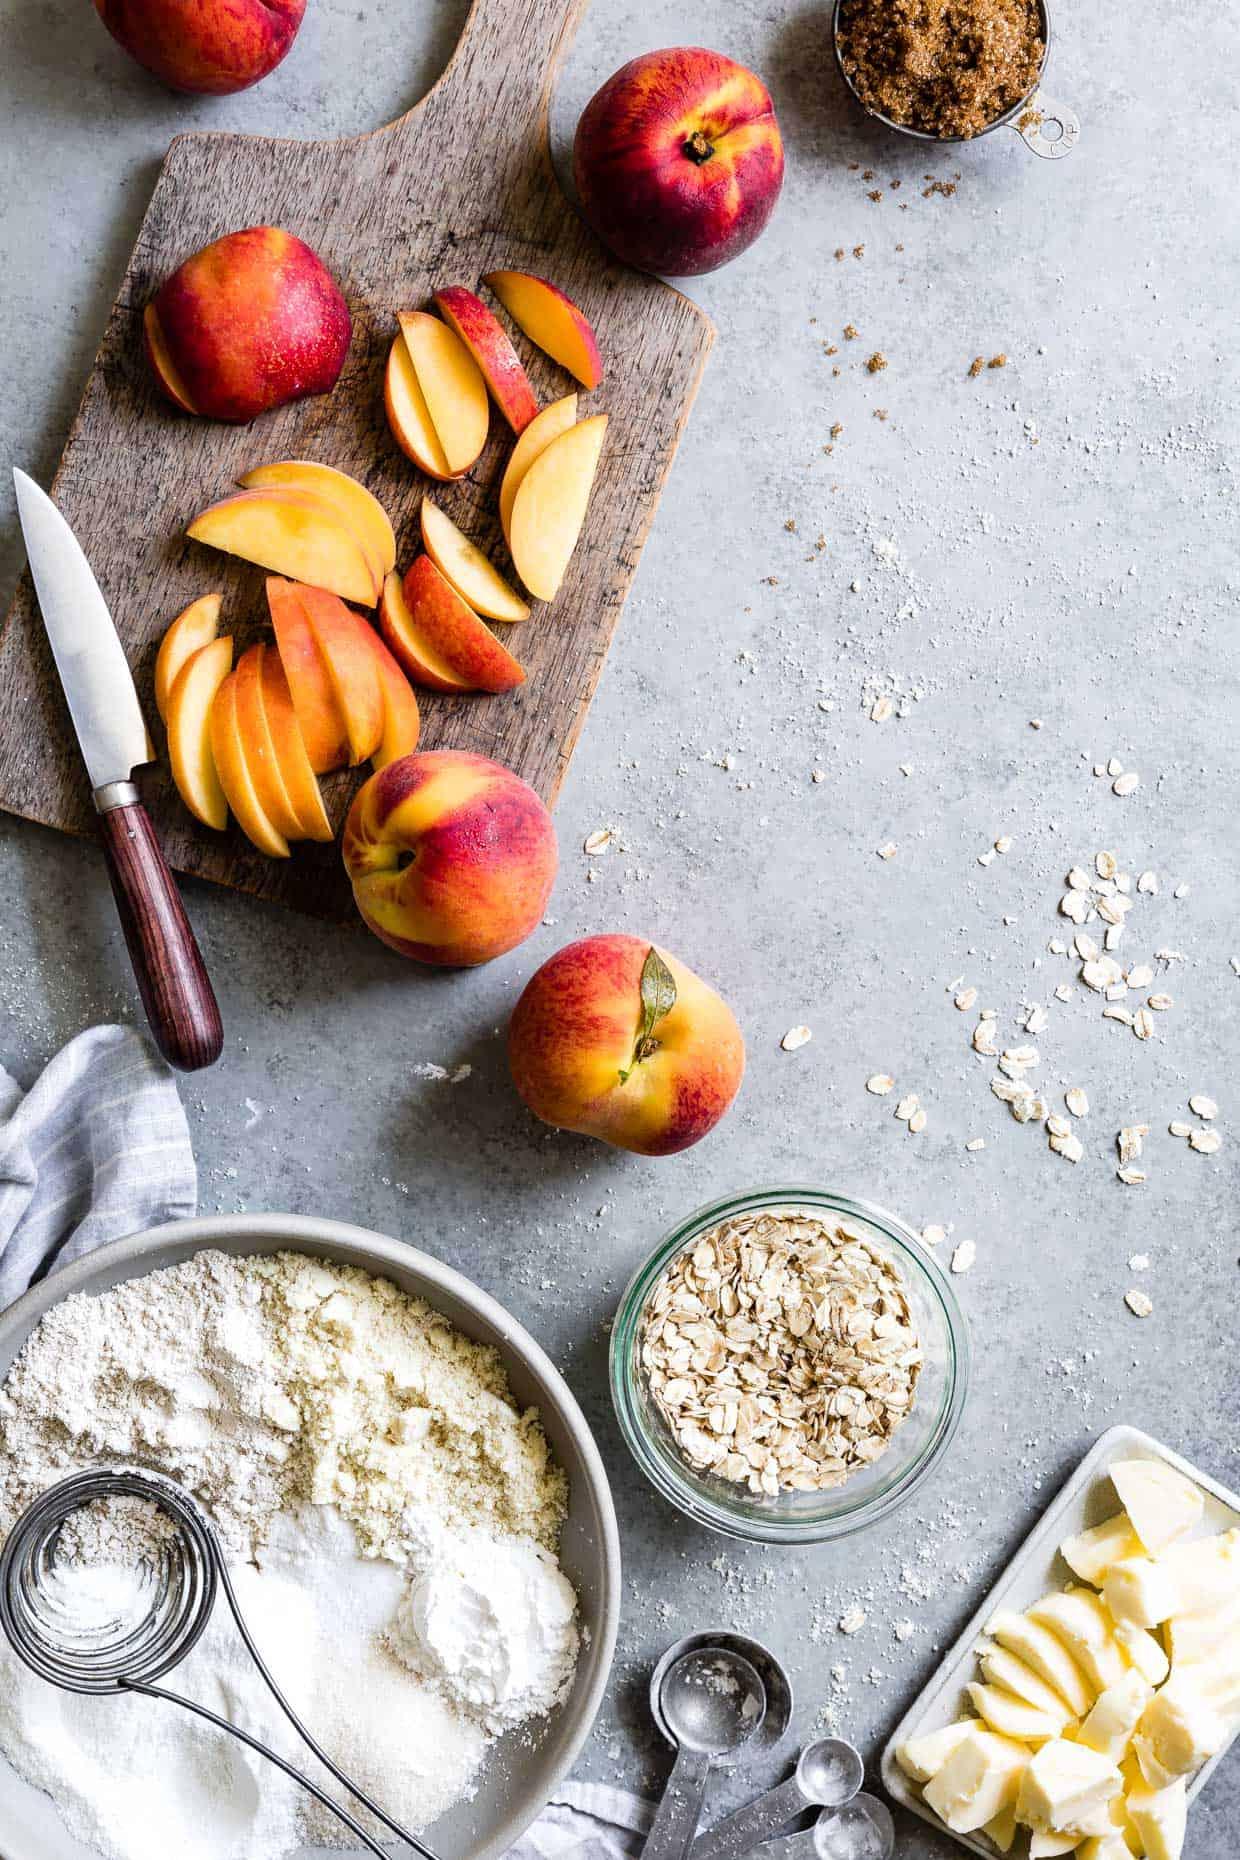 Gluten-Free Brown Sugar Peach Crumble #dessert #glutenfree #recipe #peachcrumble